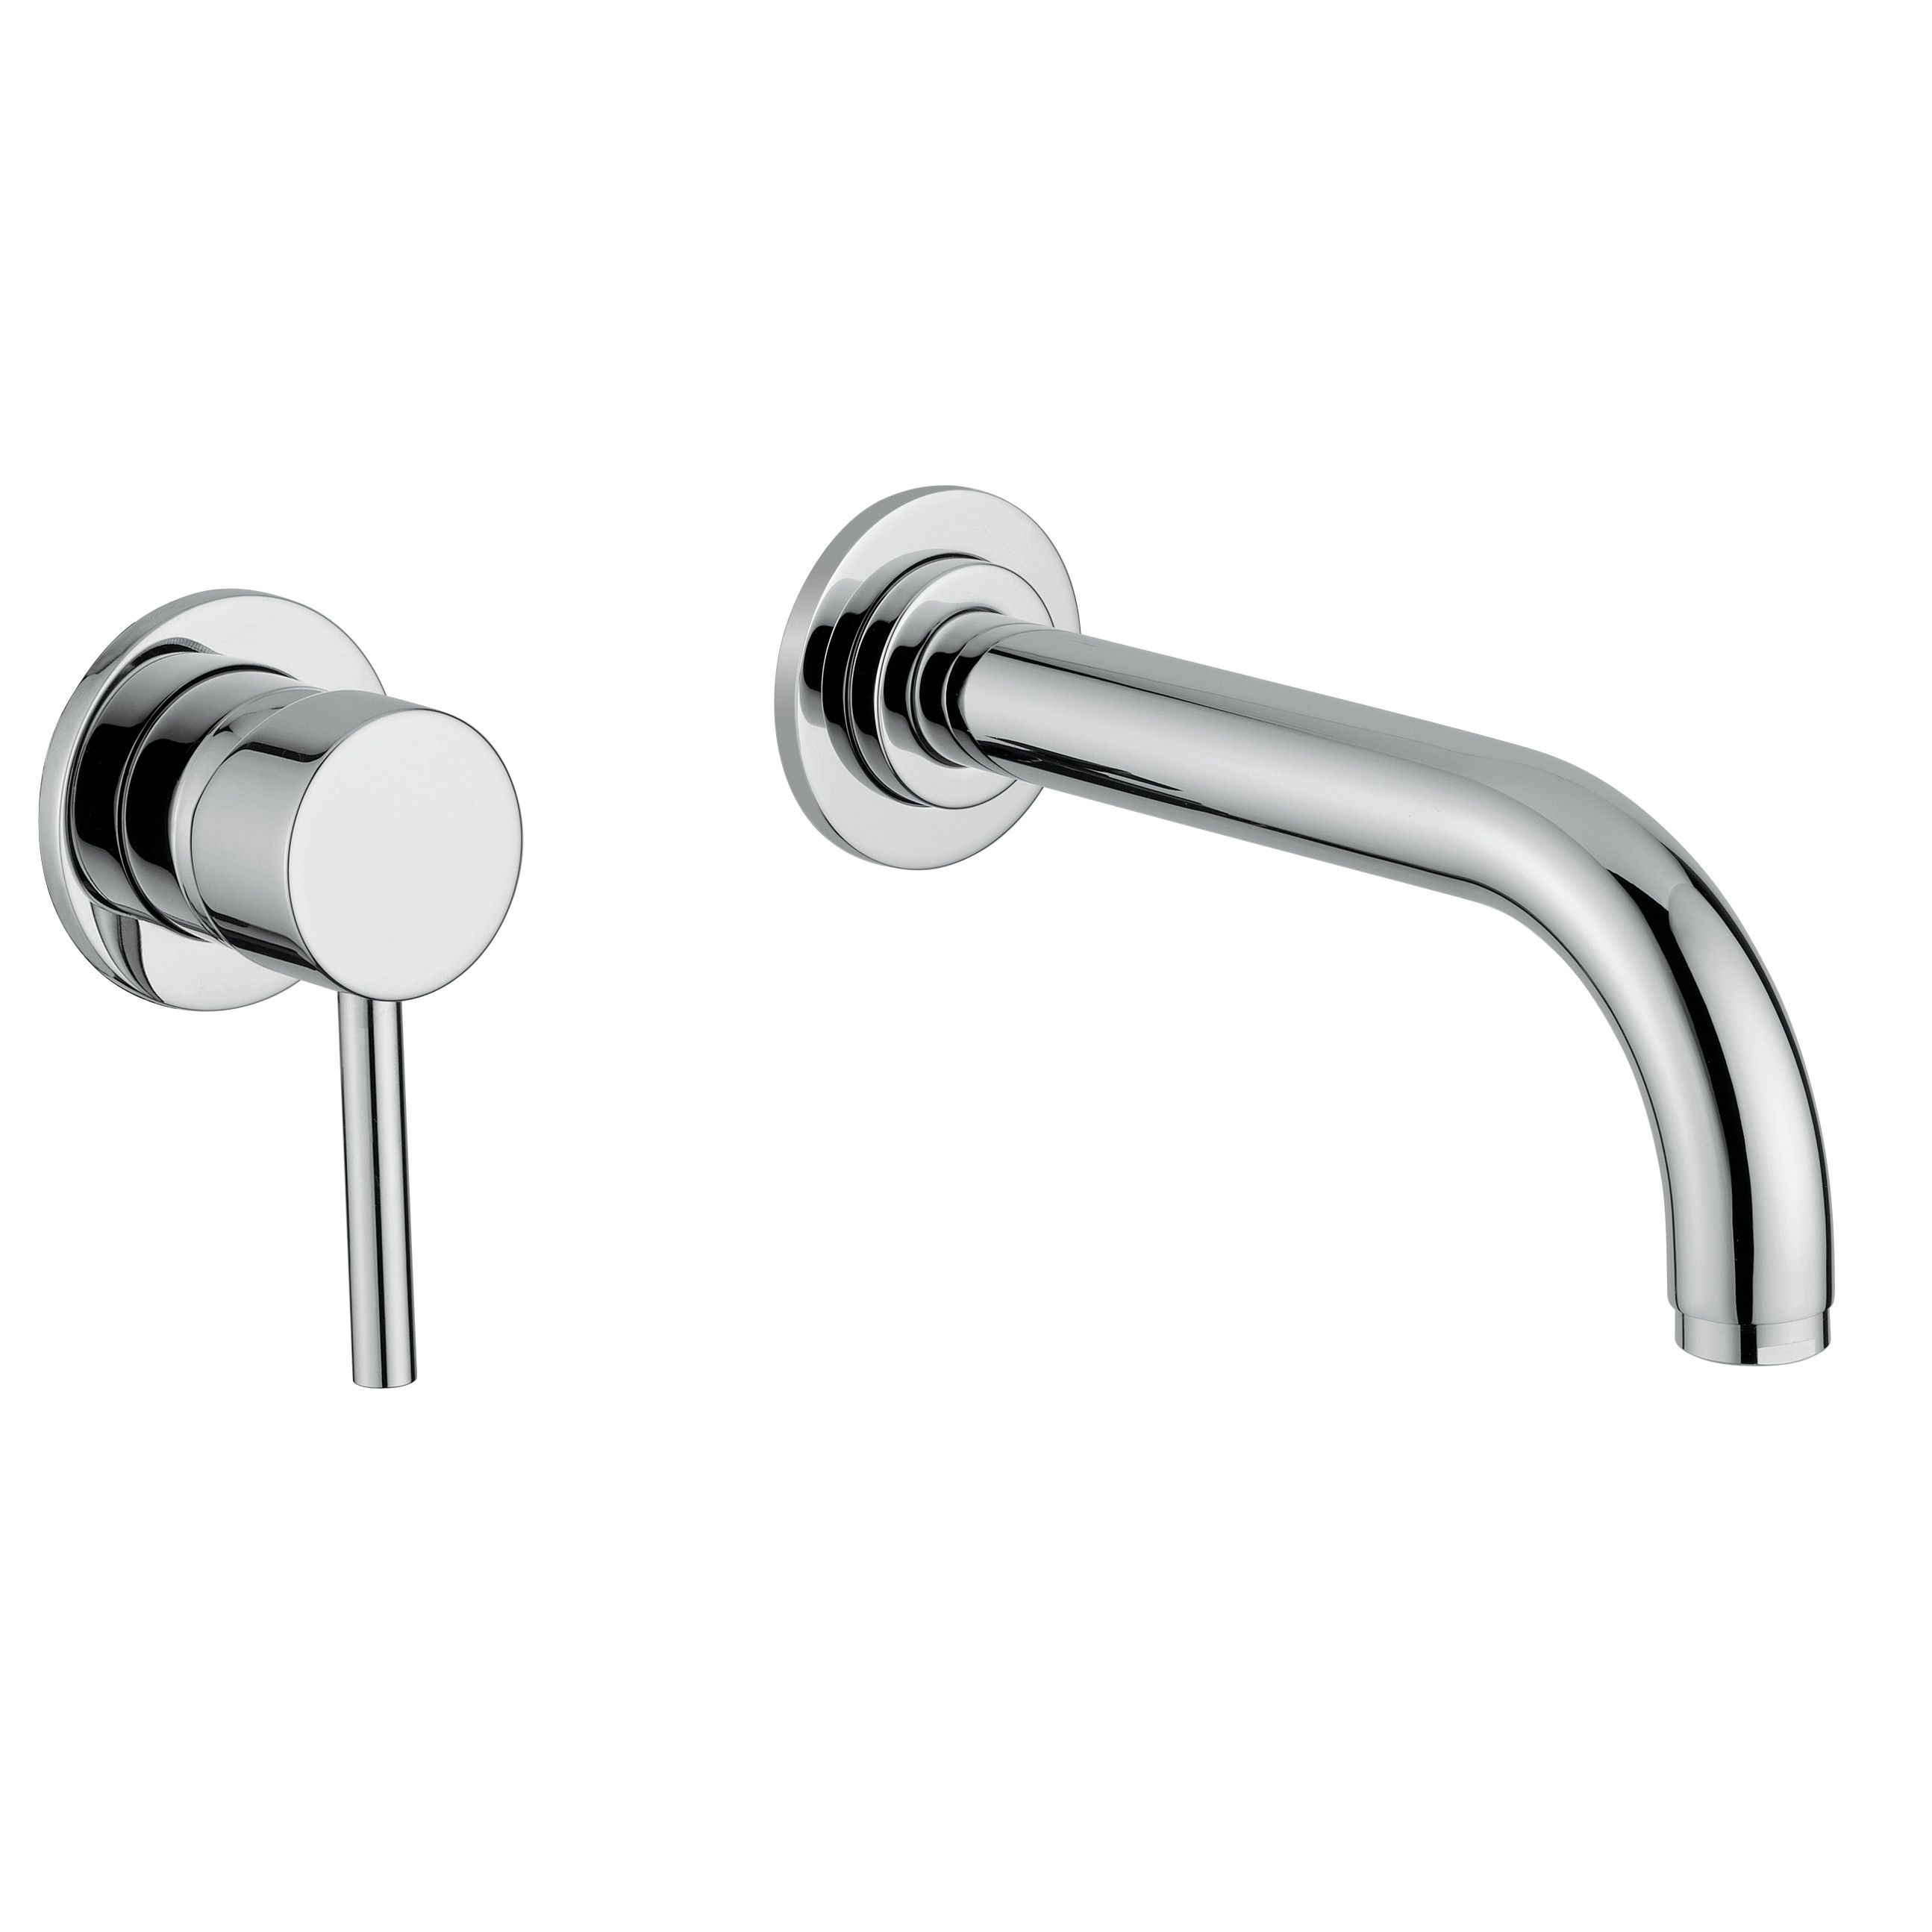 Novara Wall Mount Sink Faucet Wall Mounted Sink Faucet Wall Mounted Bathroom Sink Faucets